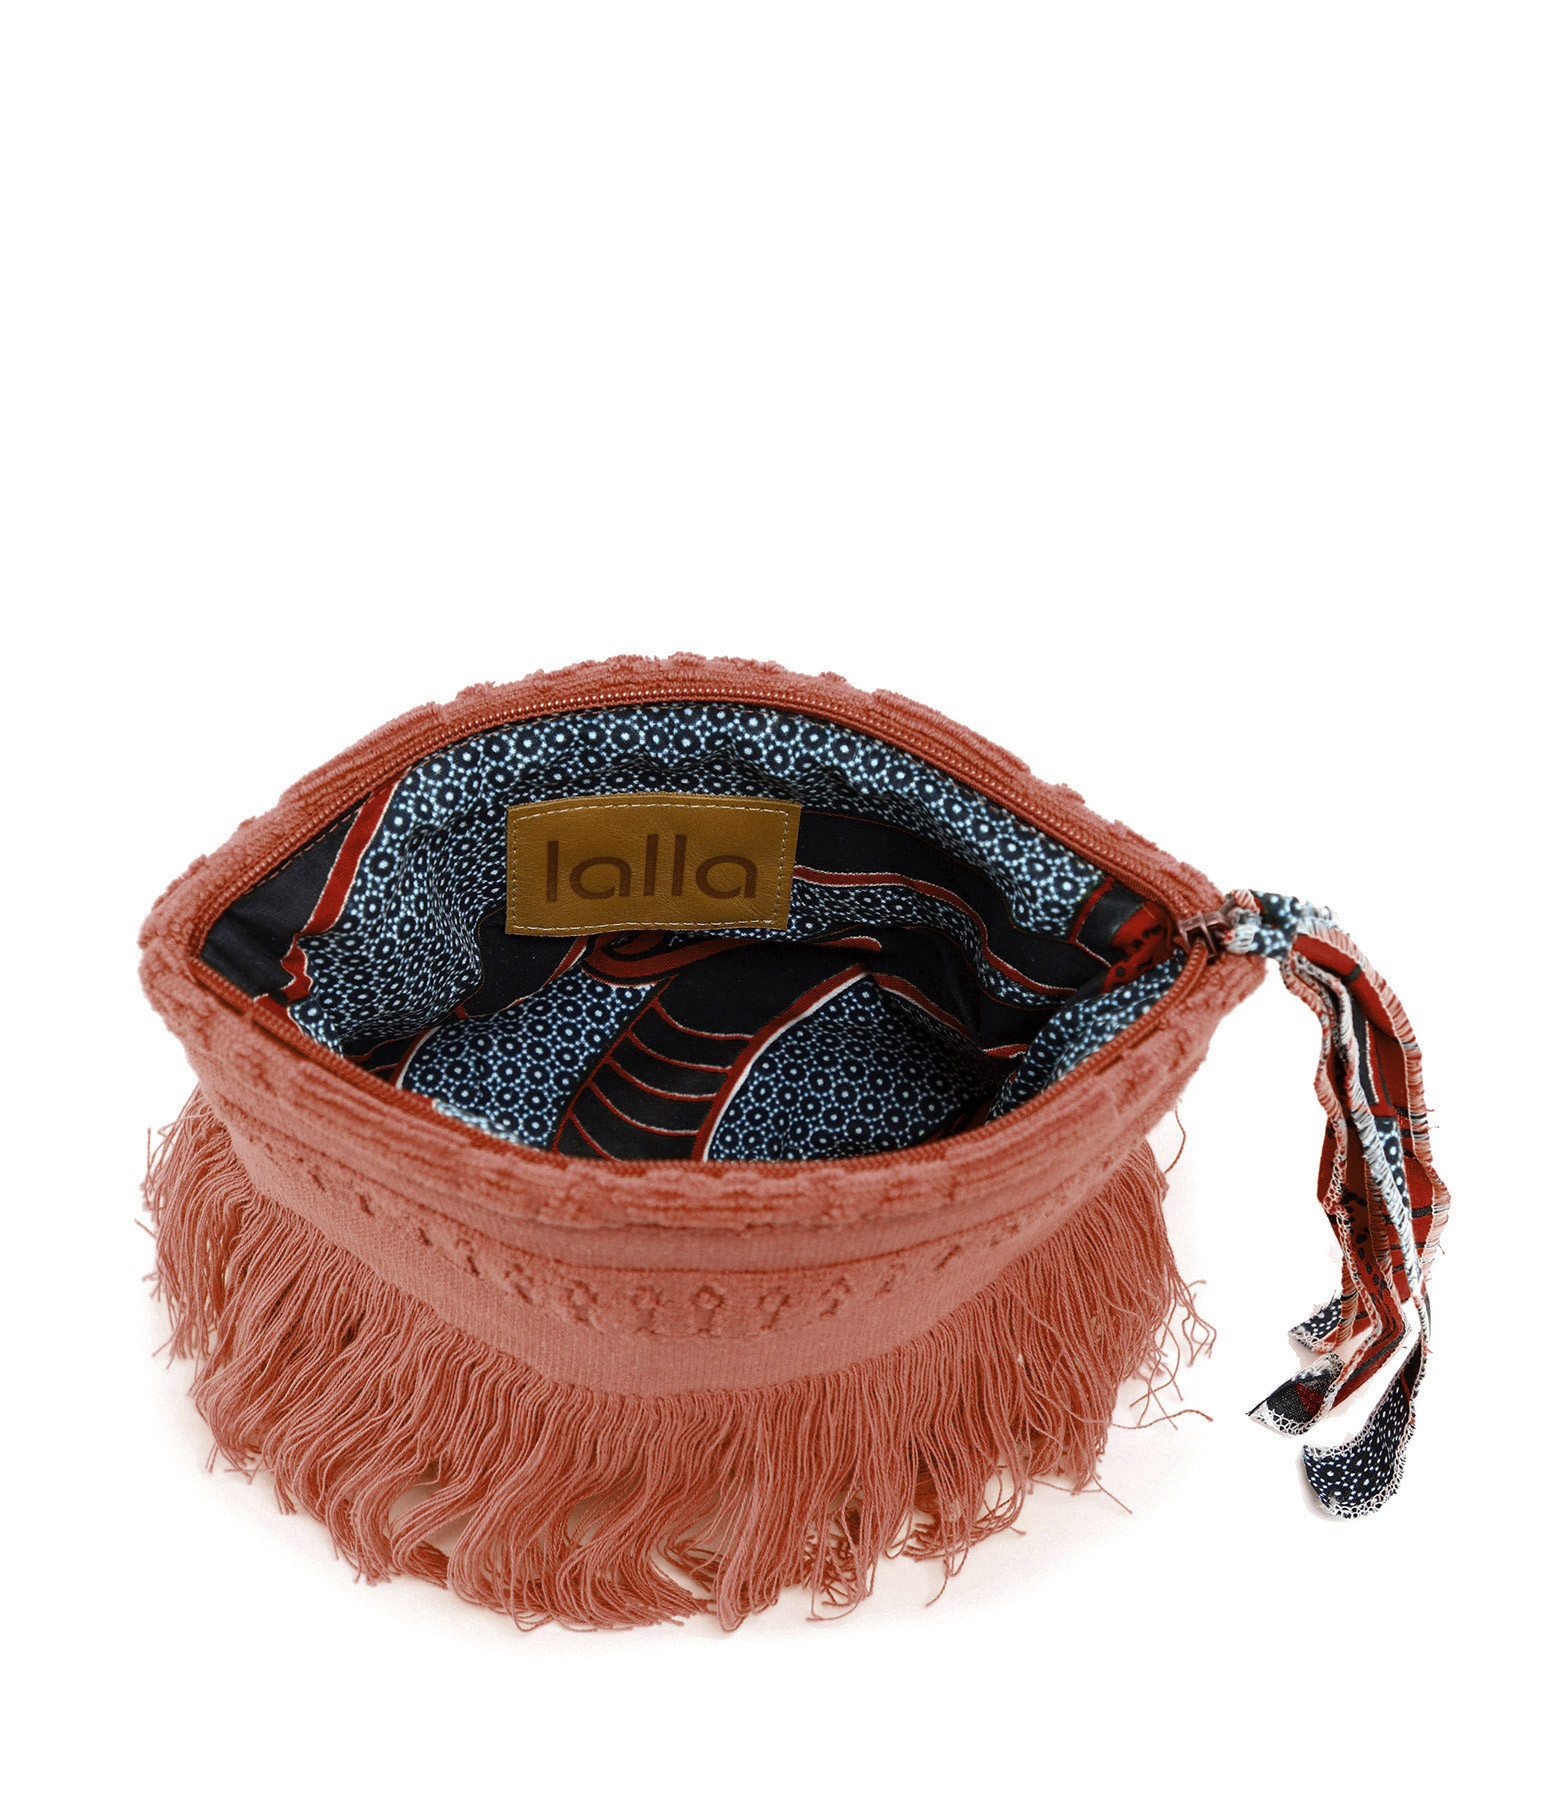 LALLA - Petite Trousse Walakin Hippie Éponge Terracotta